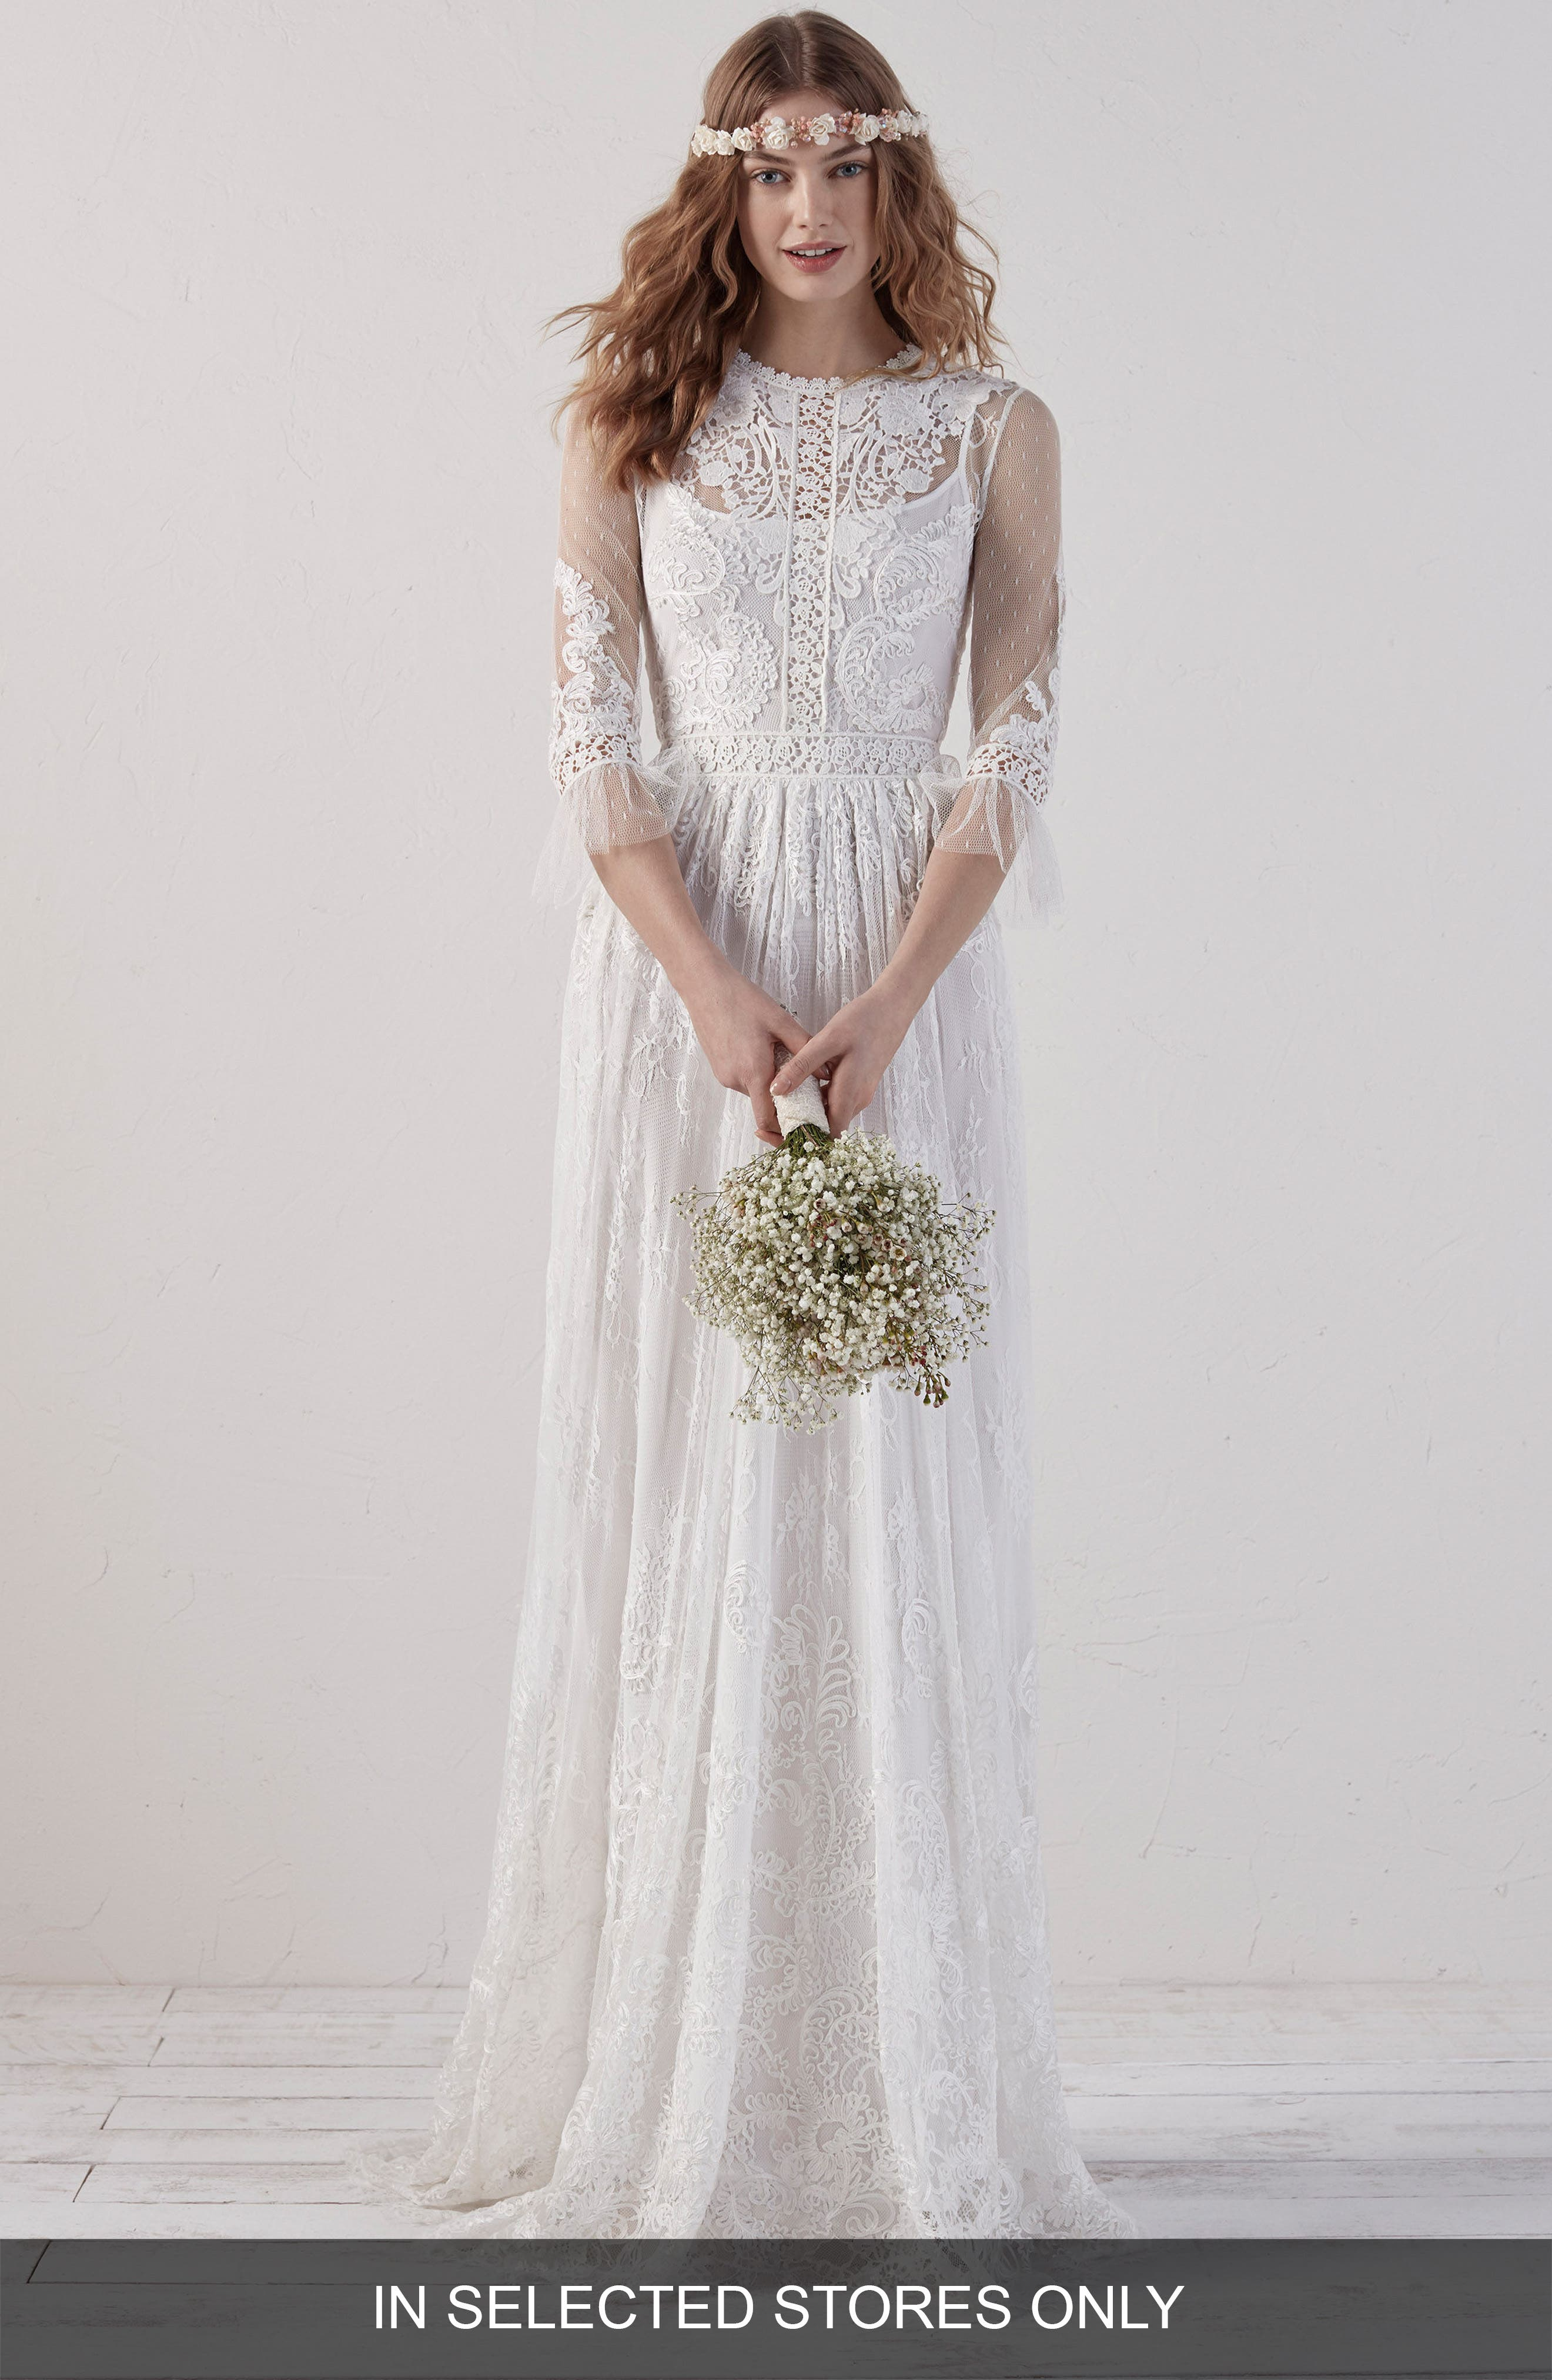 Edet Boho Lace Gown,                             Main thumbnail 1, color,                             OFF WHITE